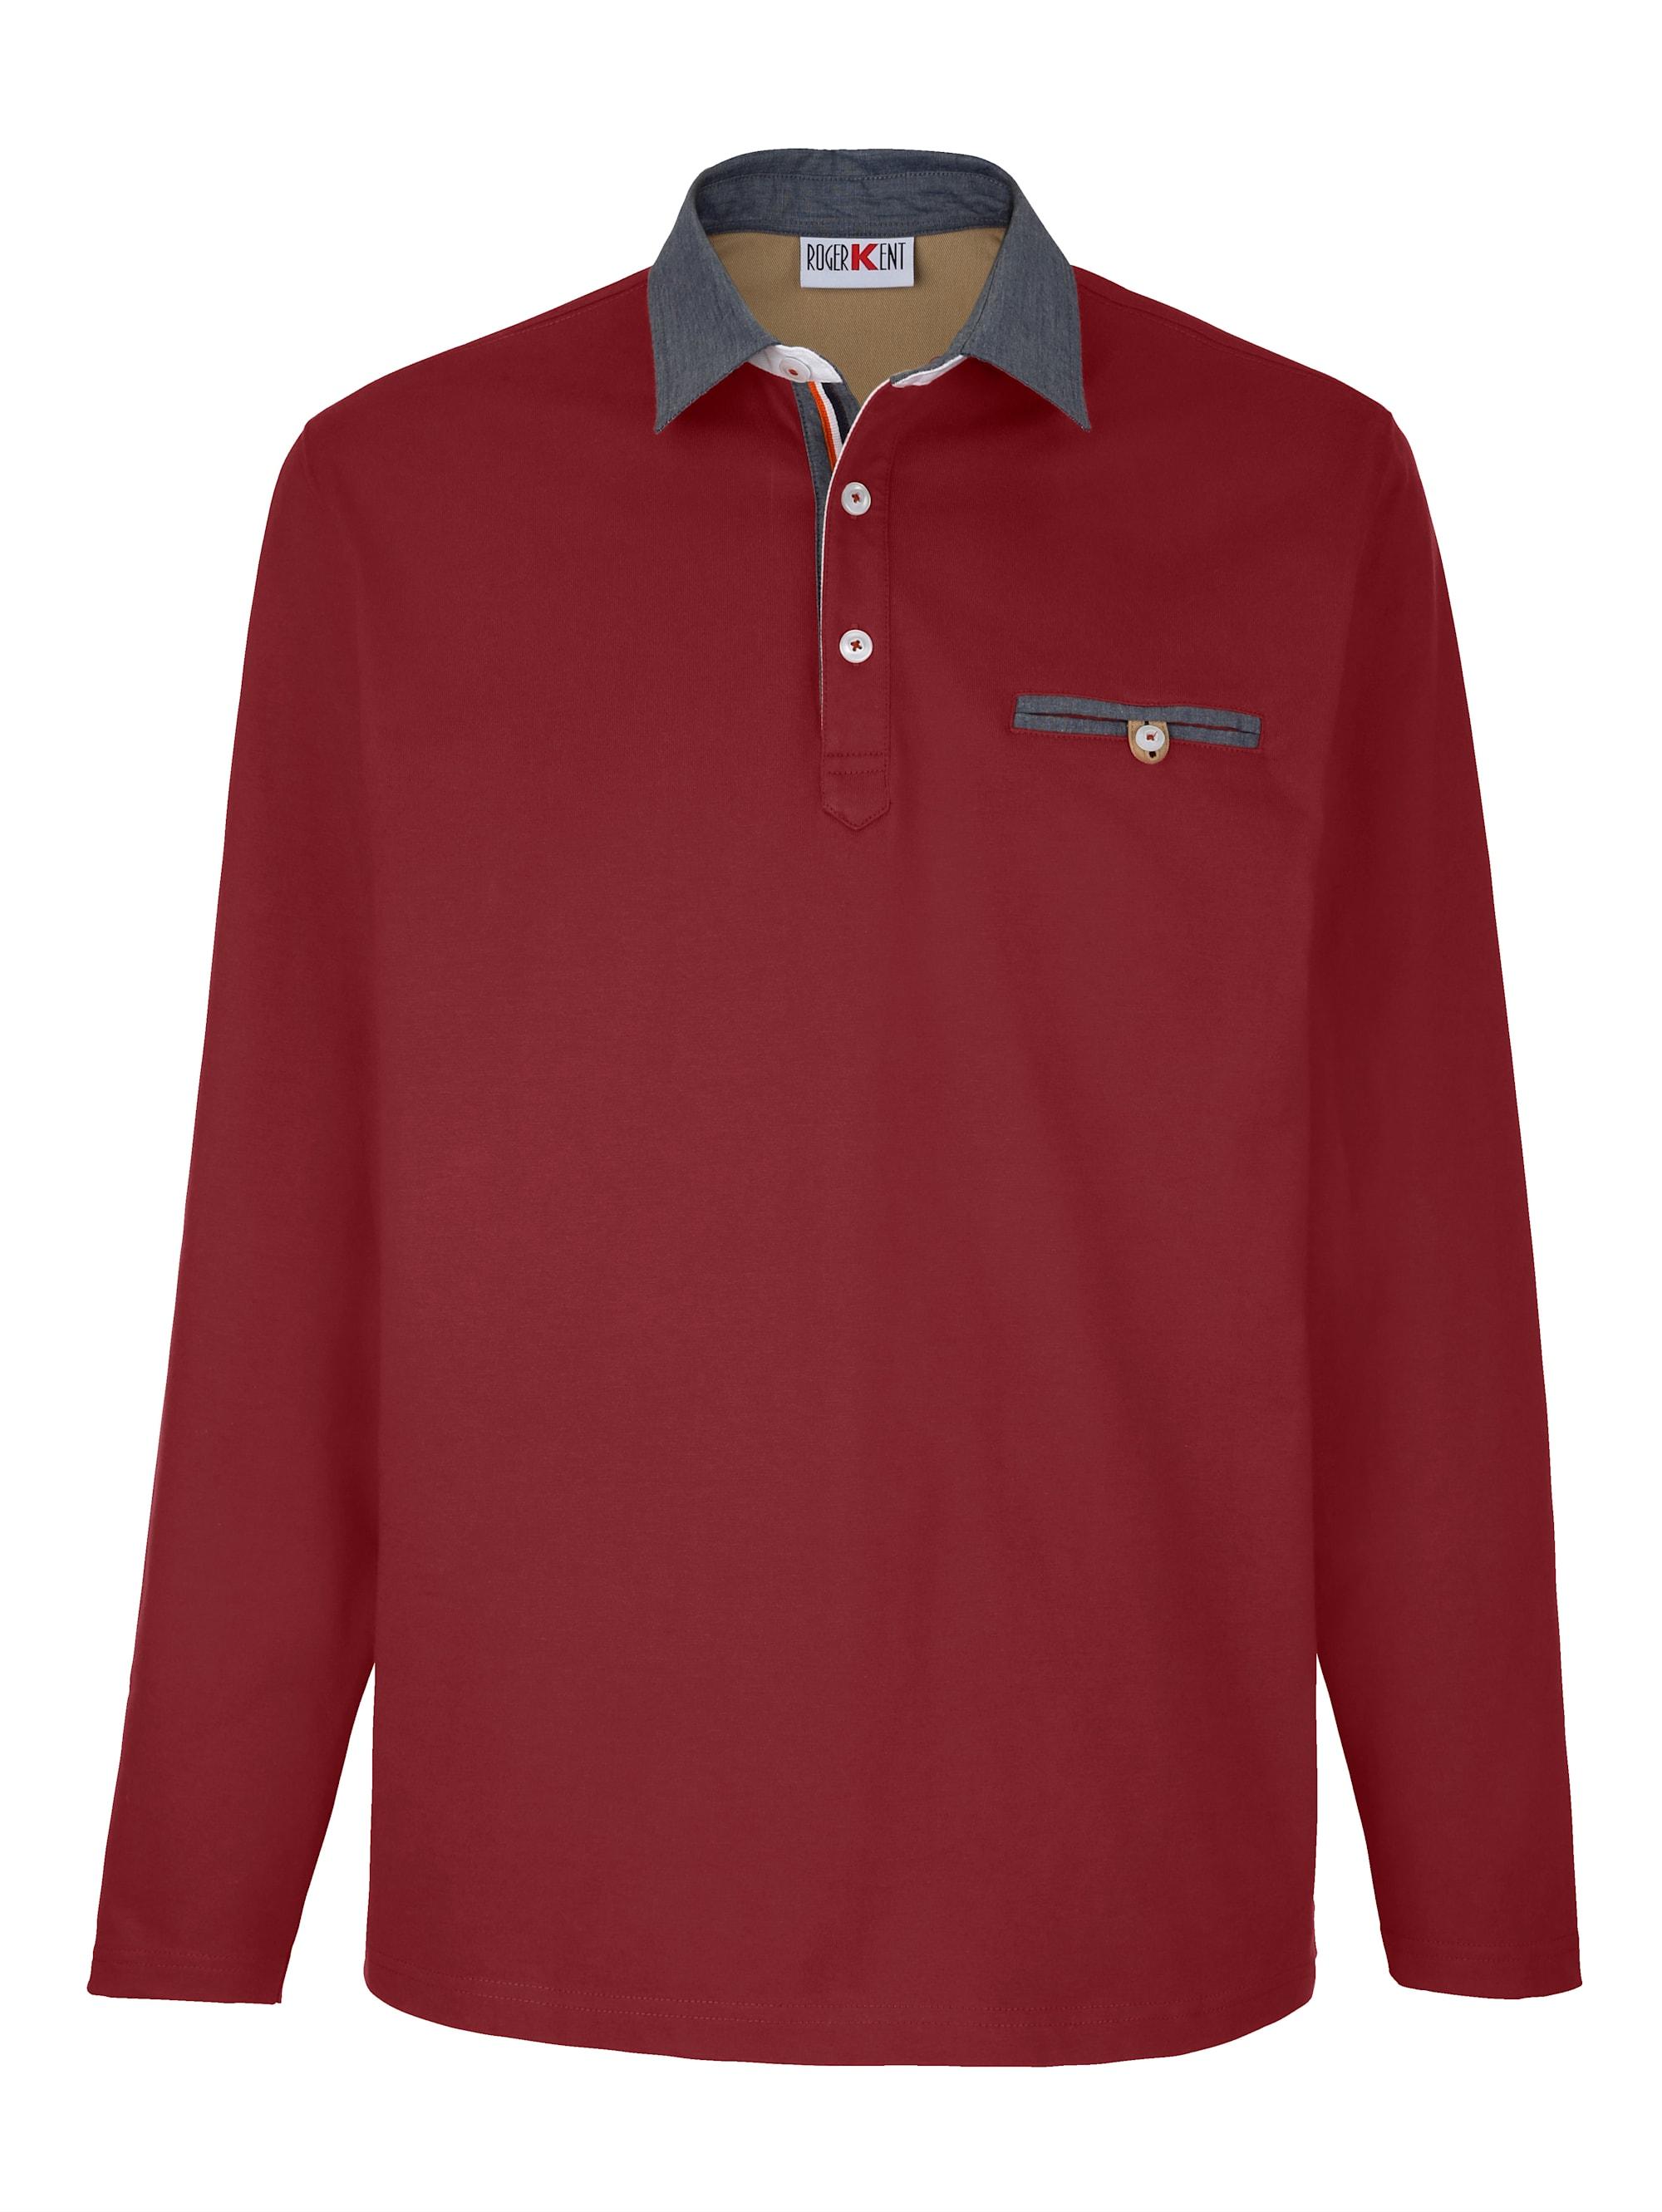 Roger Kent Poloshirt in Rot günstig kaufen